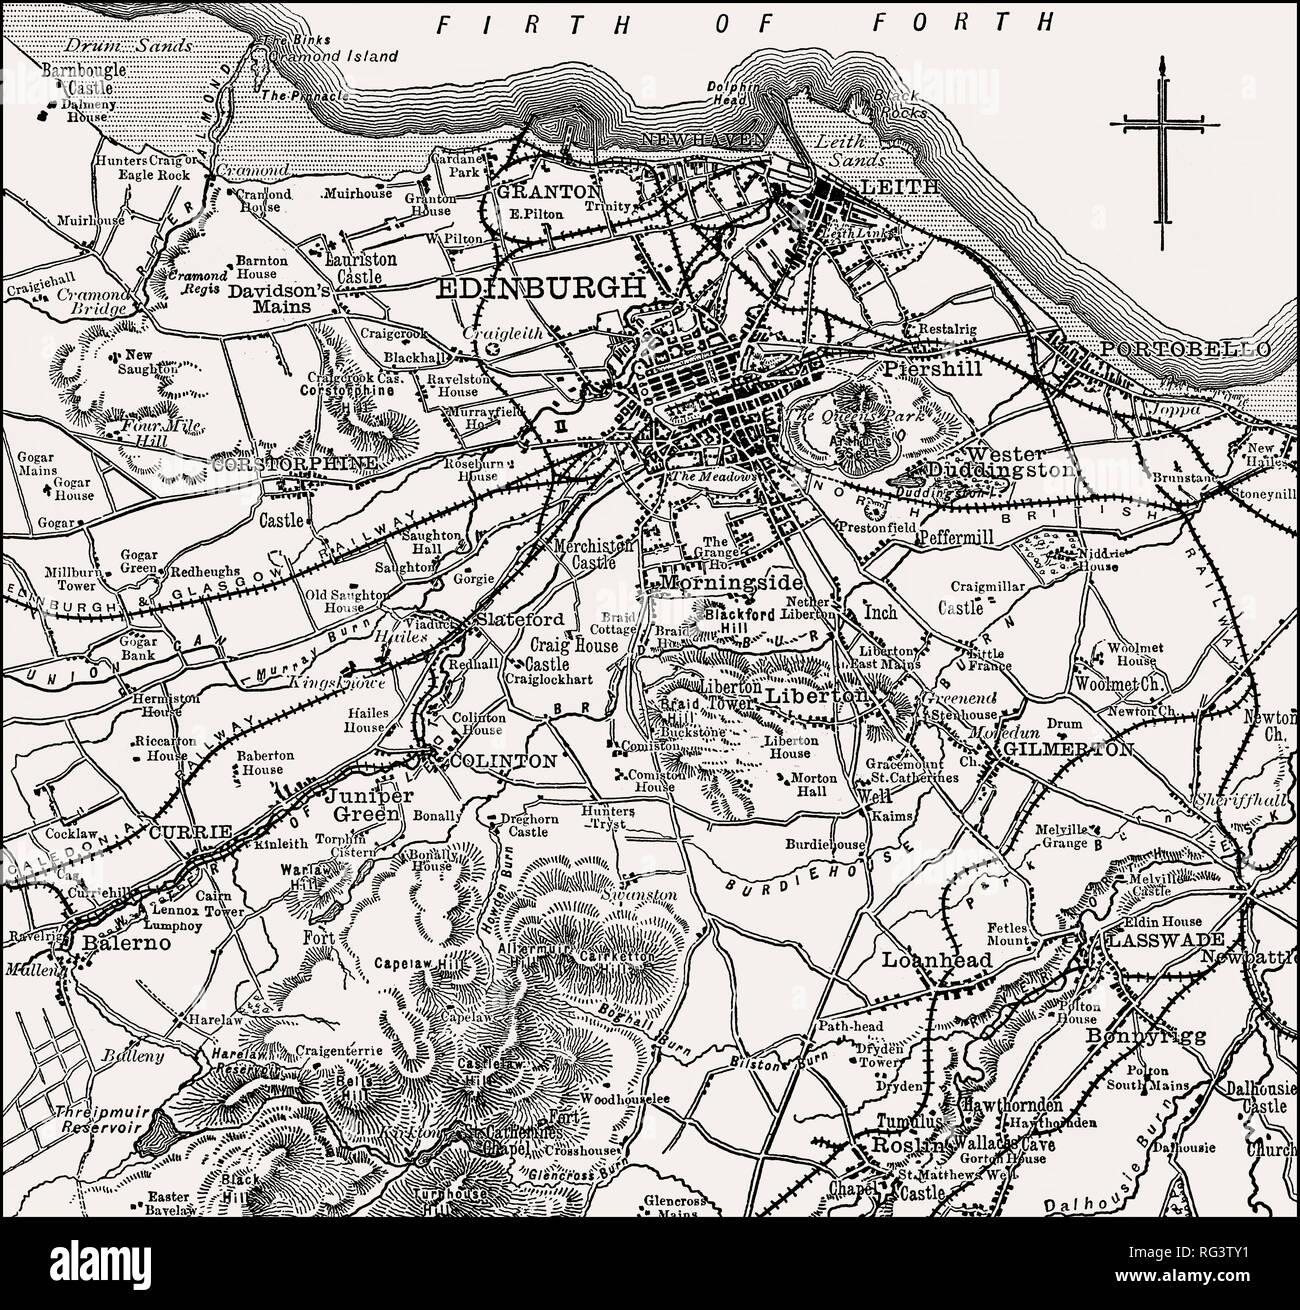 Map of Edinburgh and environs, Scotland, 19th century - Stock Image